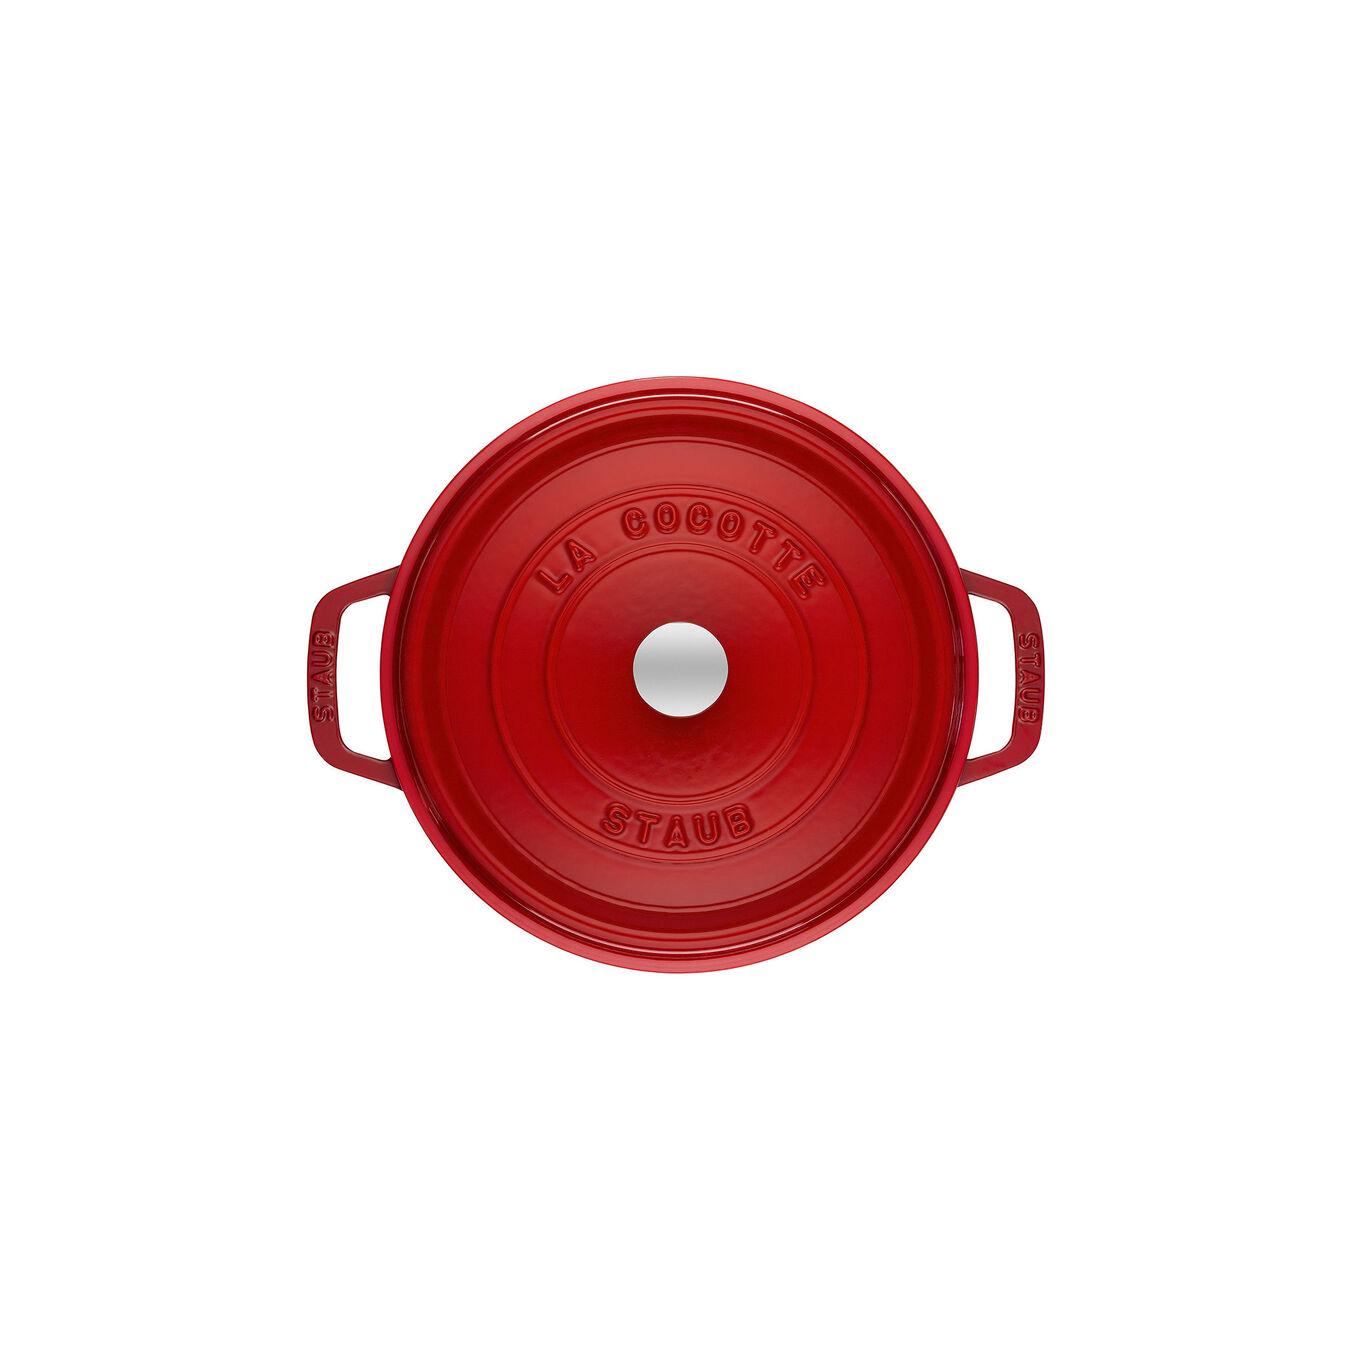 Cocotte rotonda - 18 cm, ciliegia,,large 2